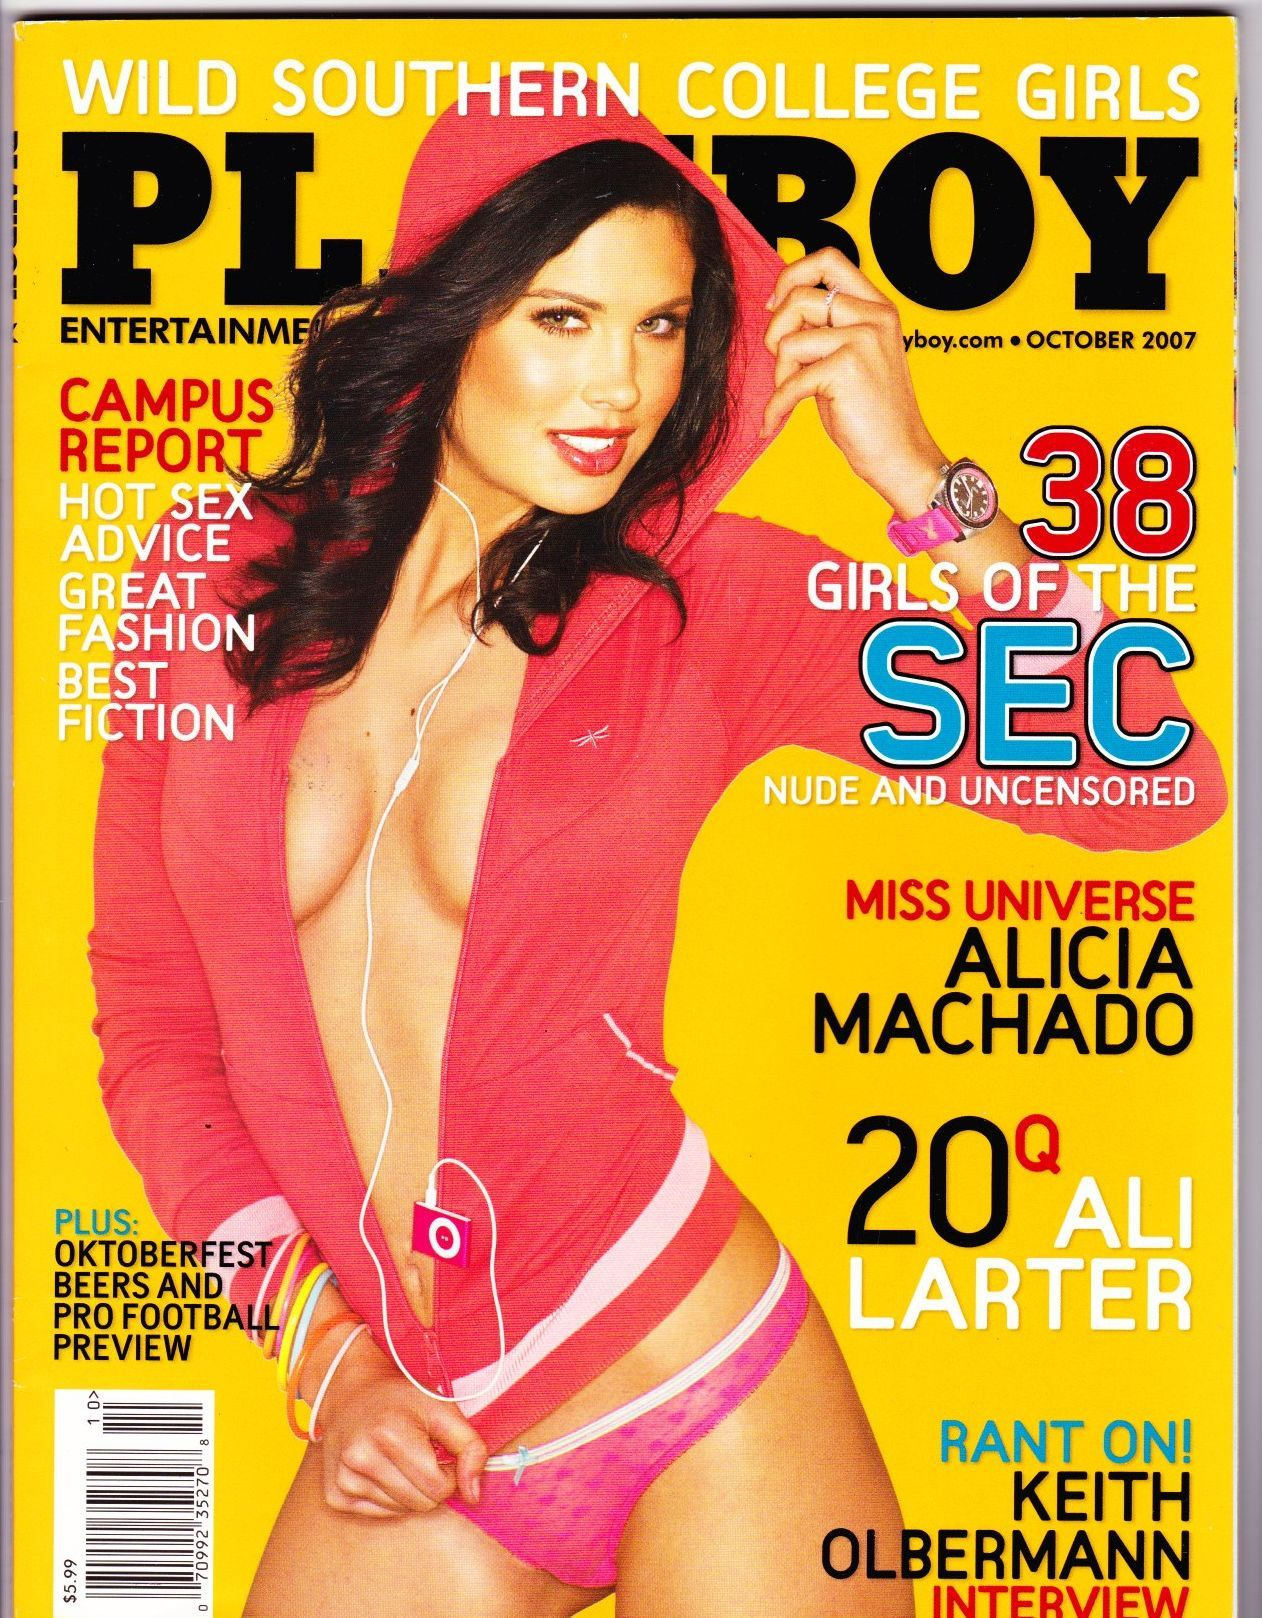 Playboy Magazine October 2007 With Scott Free Keith Olbermann